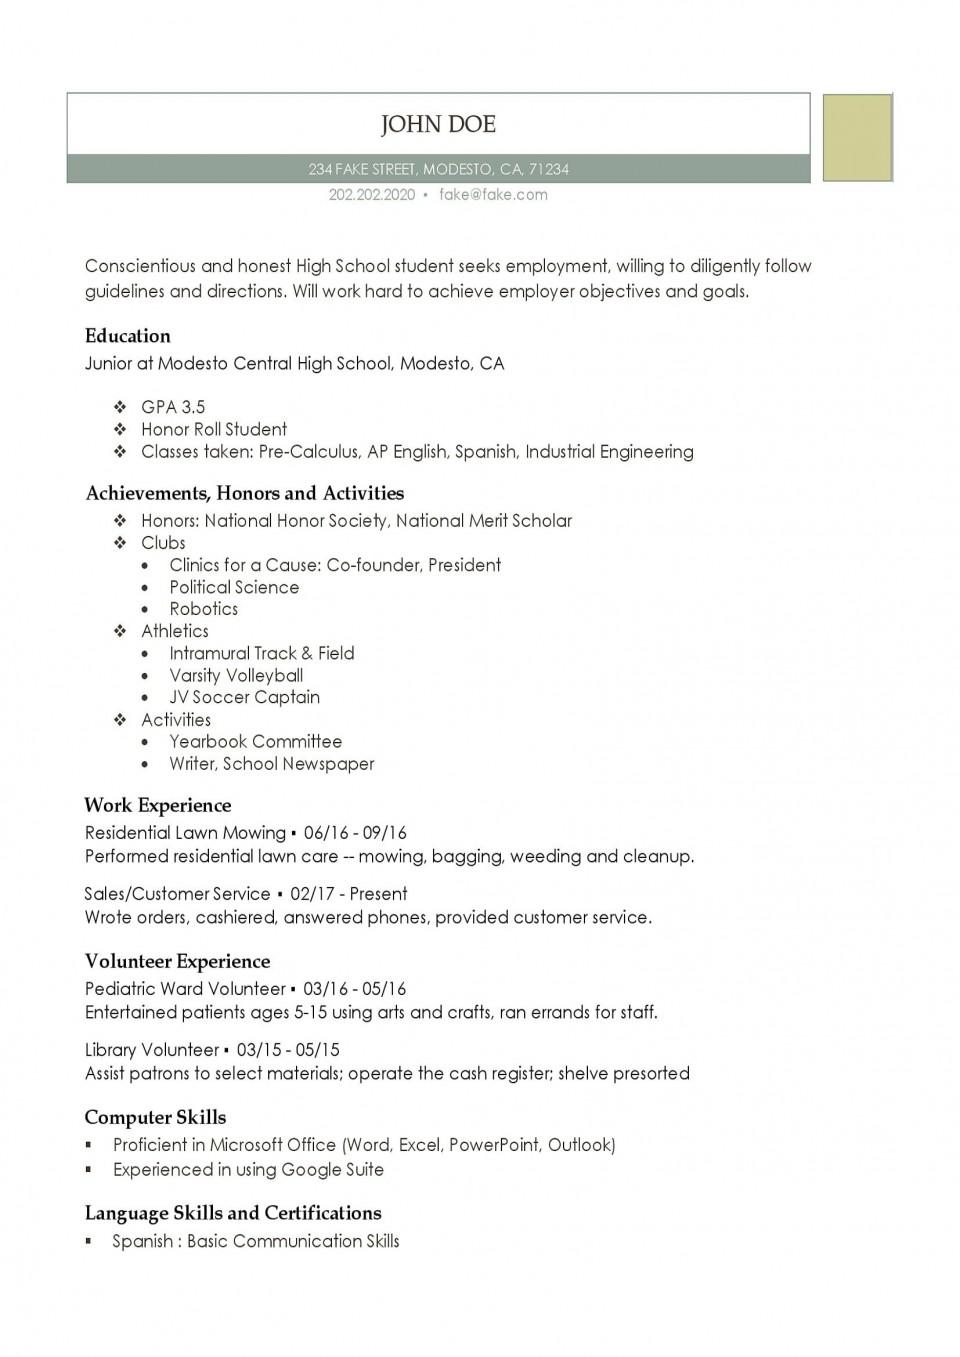 003 Unusual Basic Student Resume Template Picture  Simple Word High School Australia Google Doc960